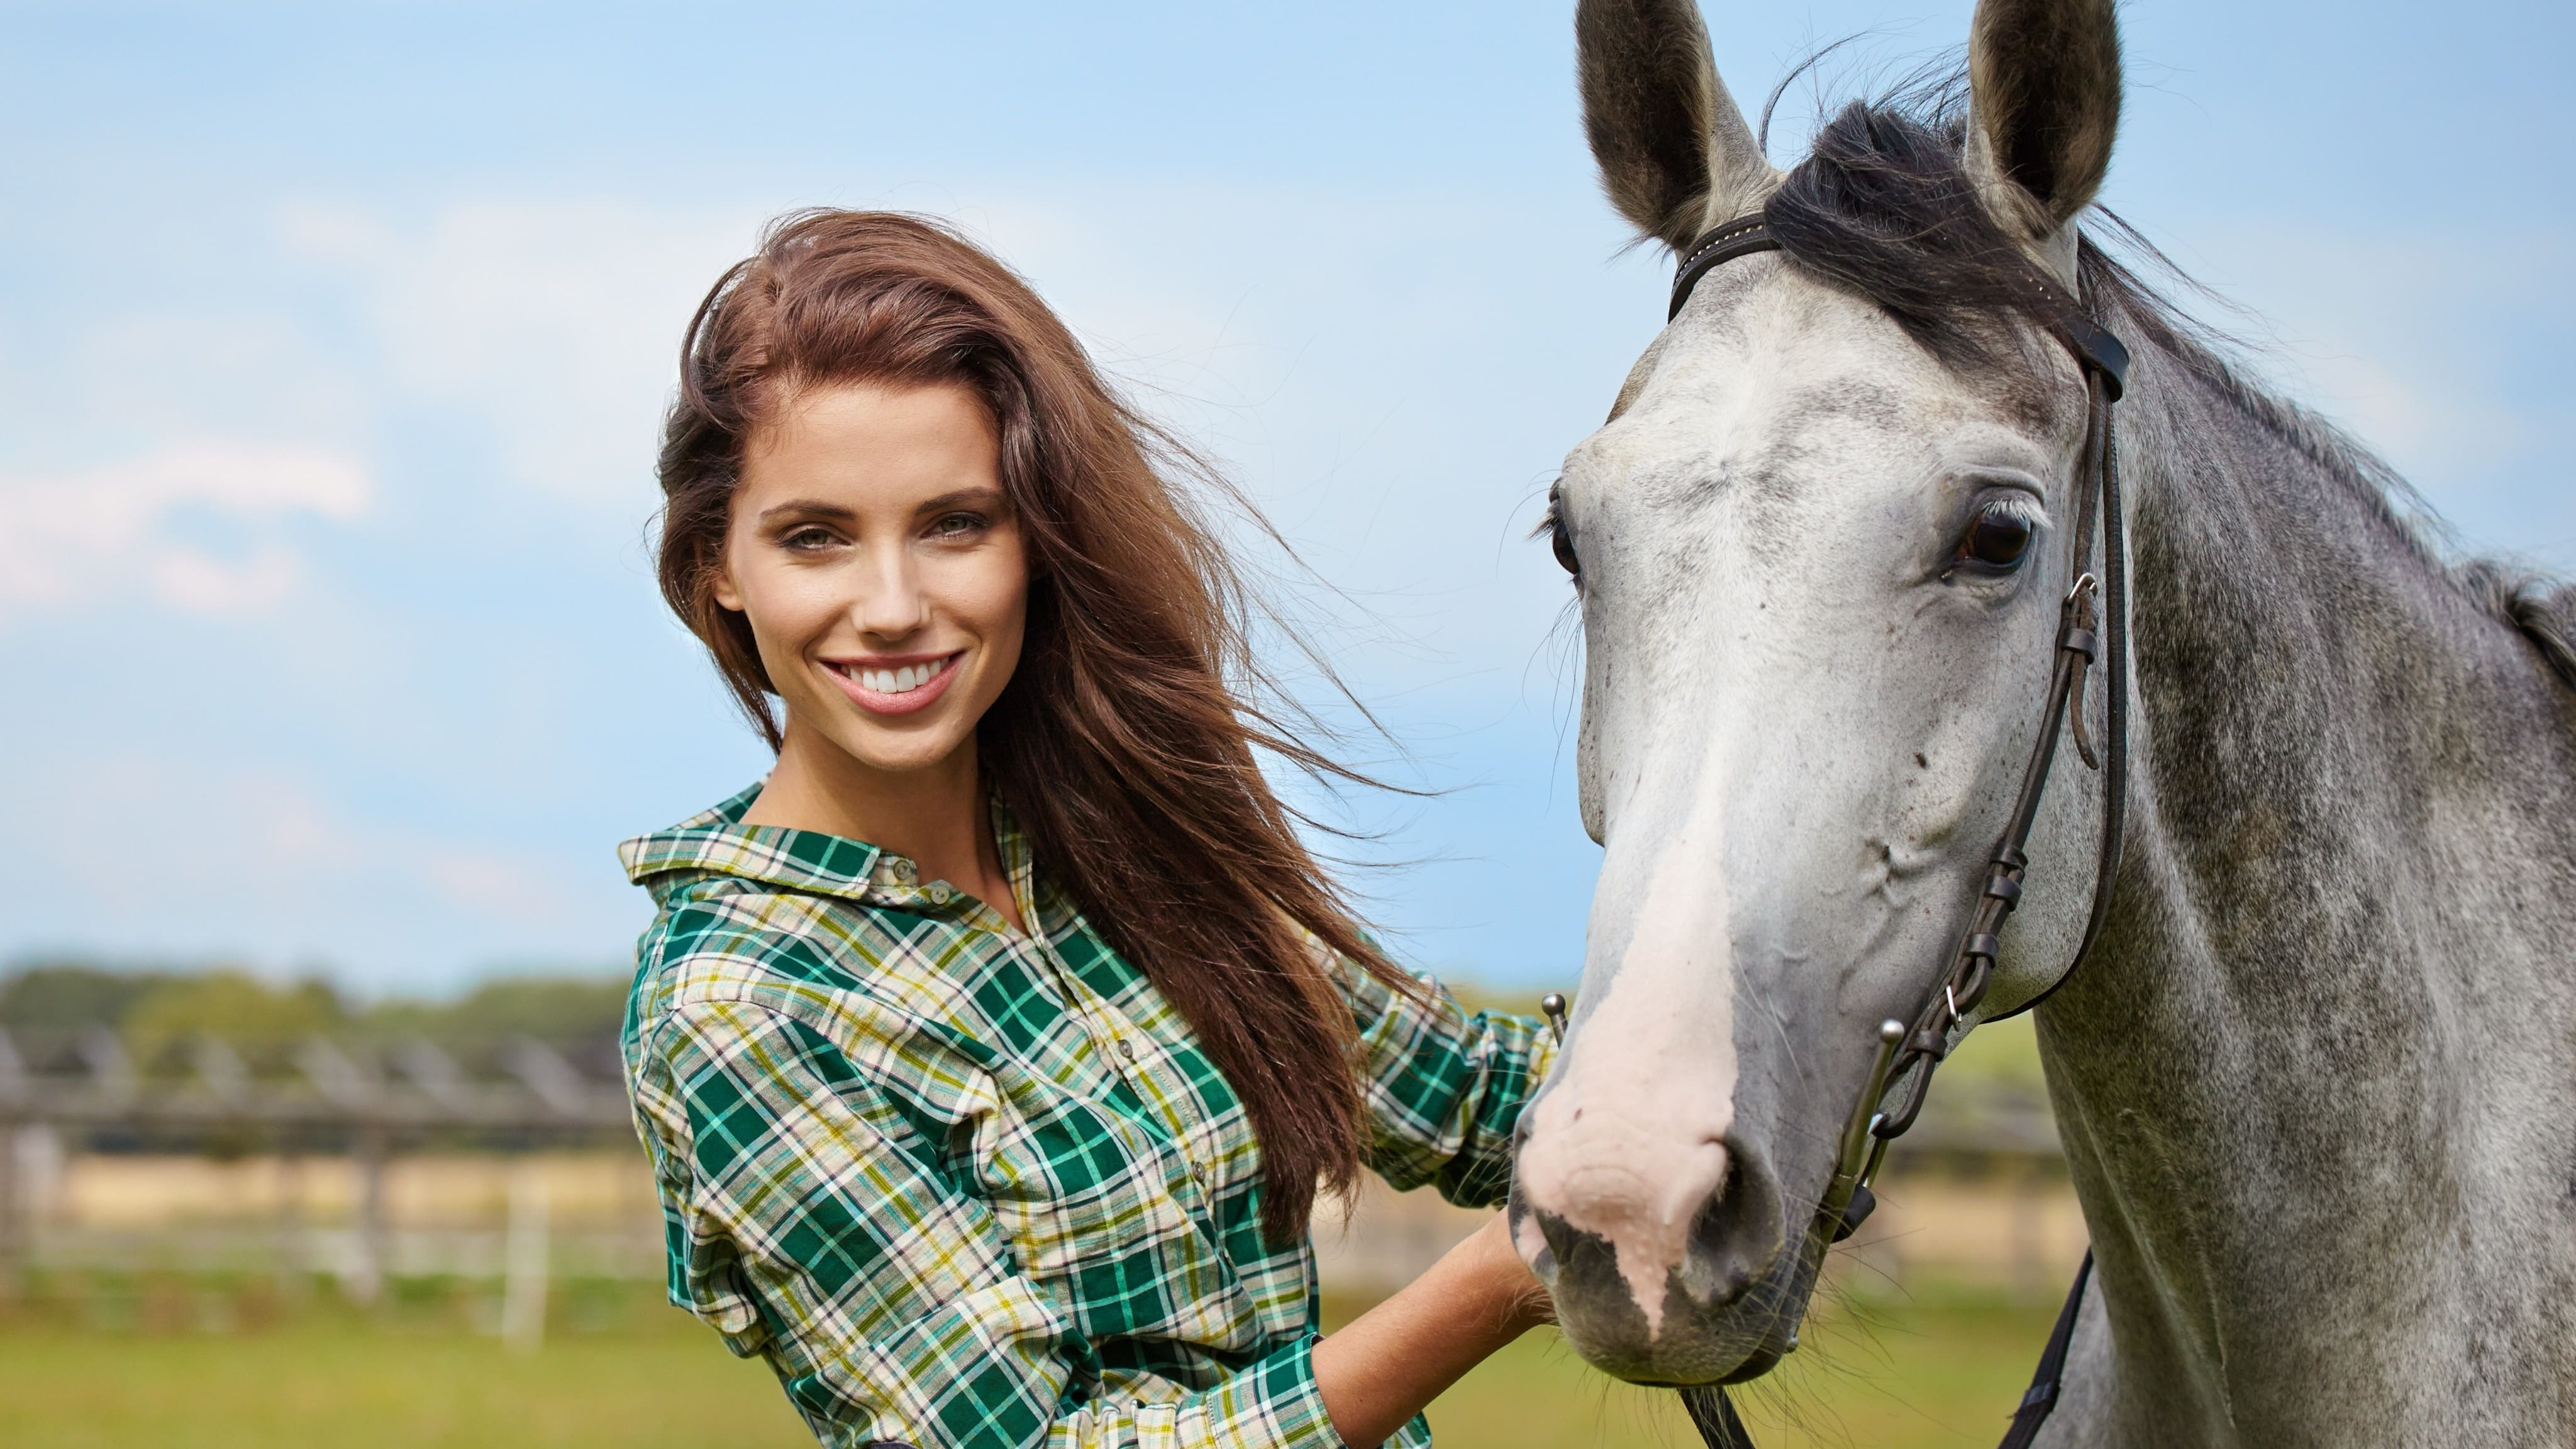 HDoboi.Kiev.ua - Красивая шатенка и лошадь, 4k обои на рабочий стол девушки